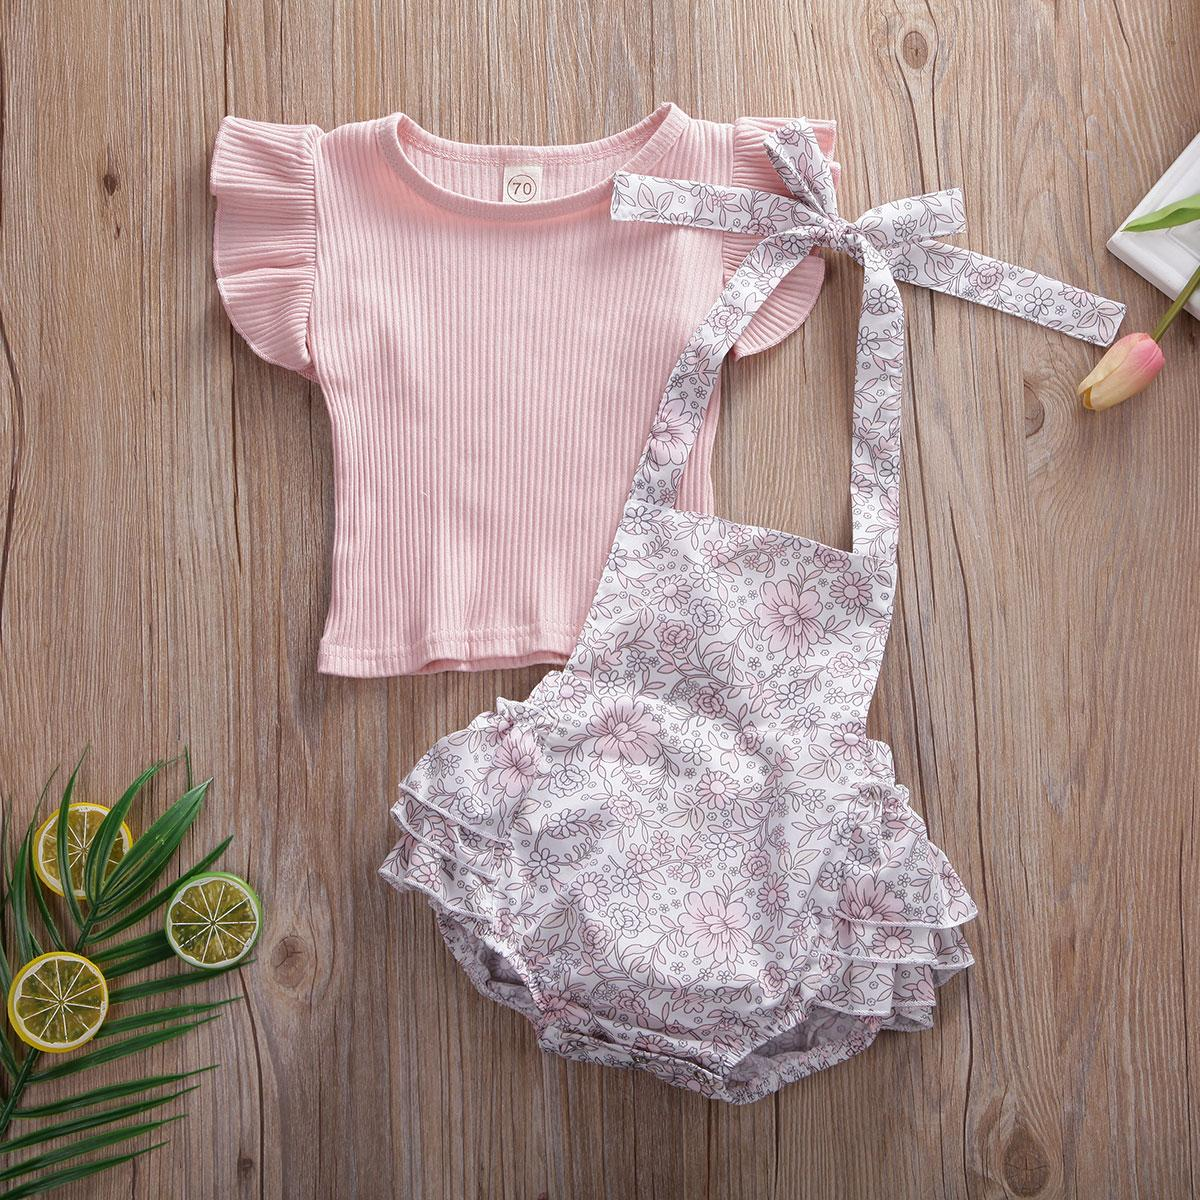 0-18m 2 stücke Neugeborene Baby Mädchen Outfits Kleidung Tops Hemd + Tutu Shorts Hosen Set